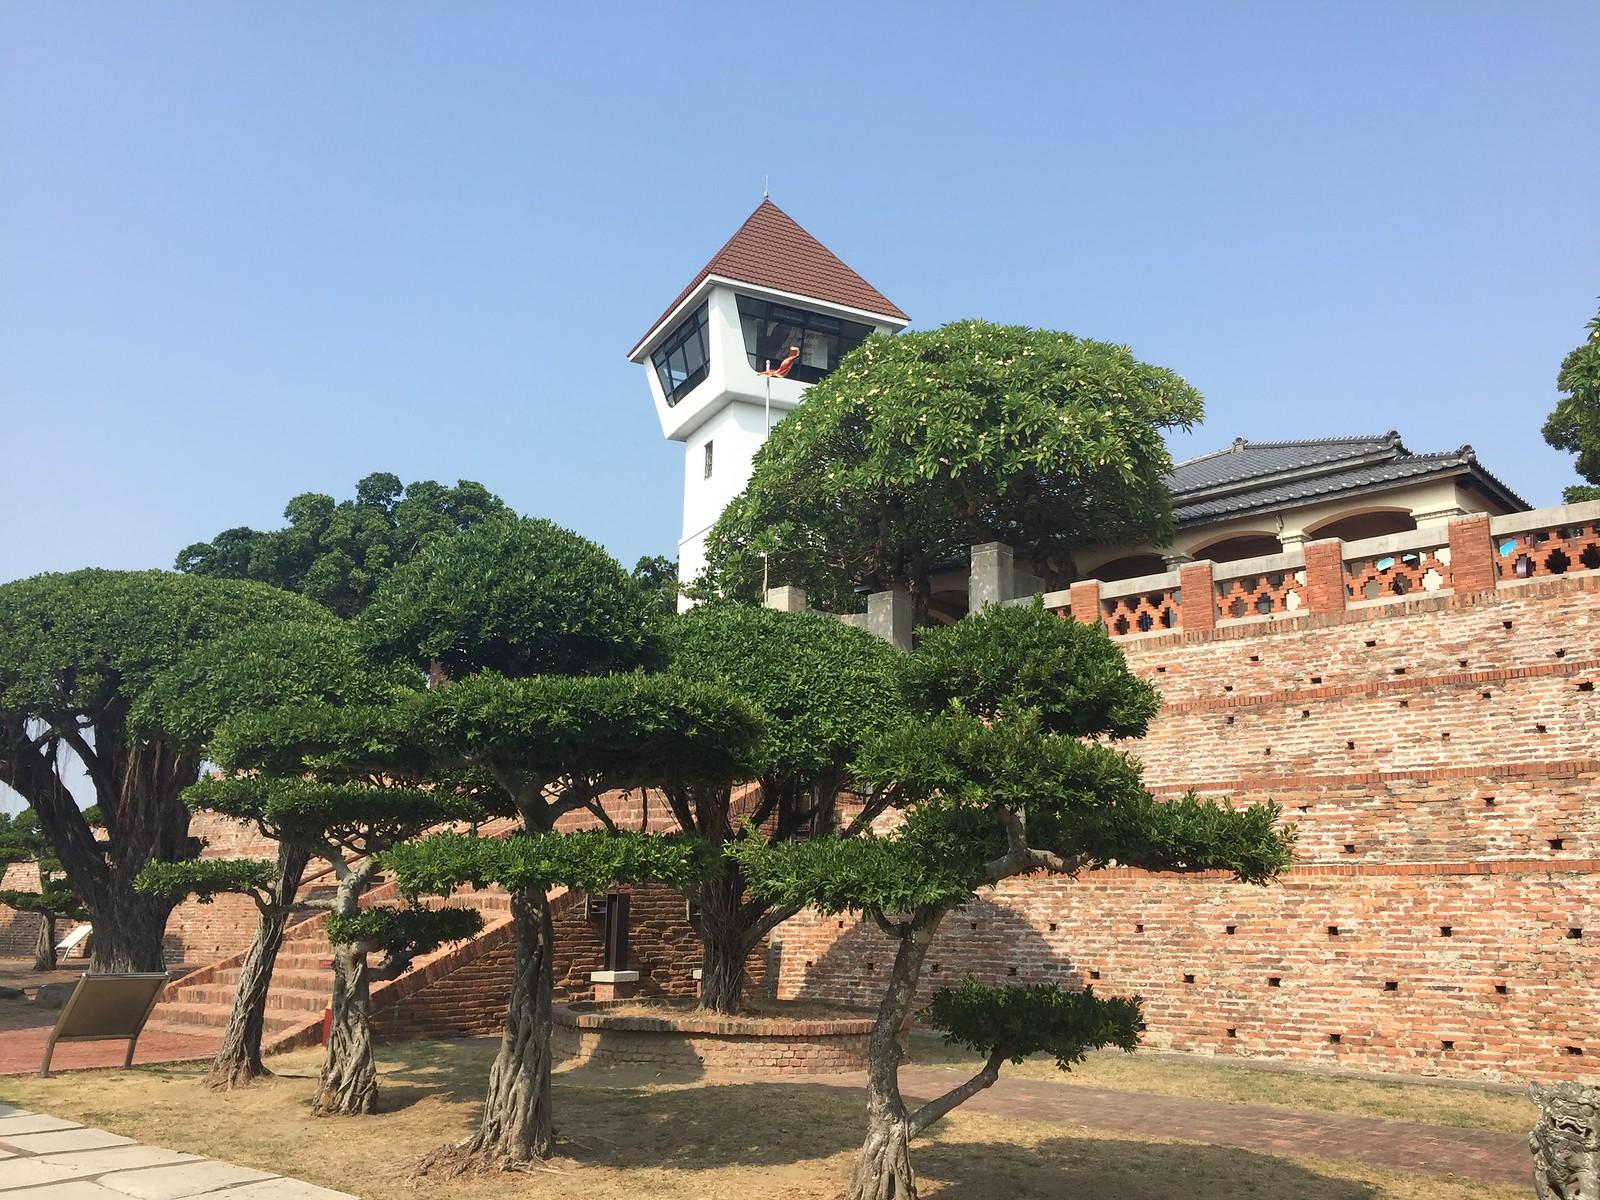 Tainan Fort Zeelandia